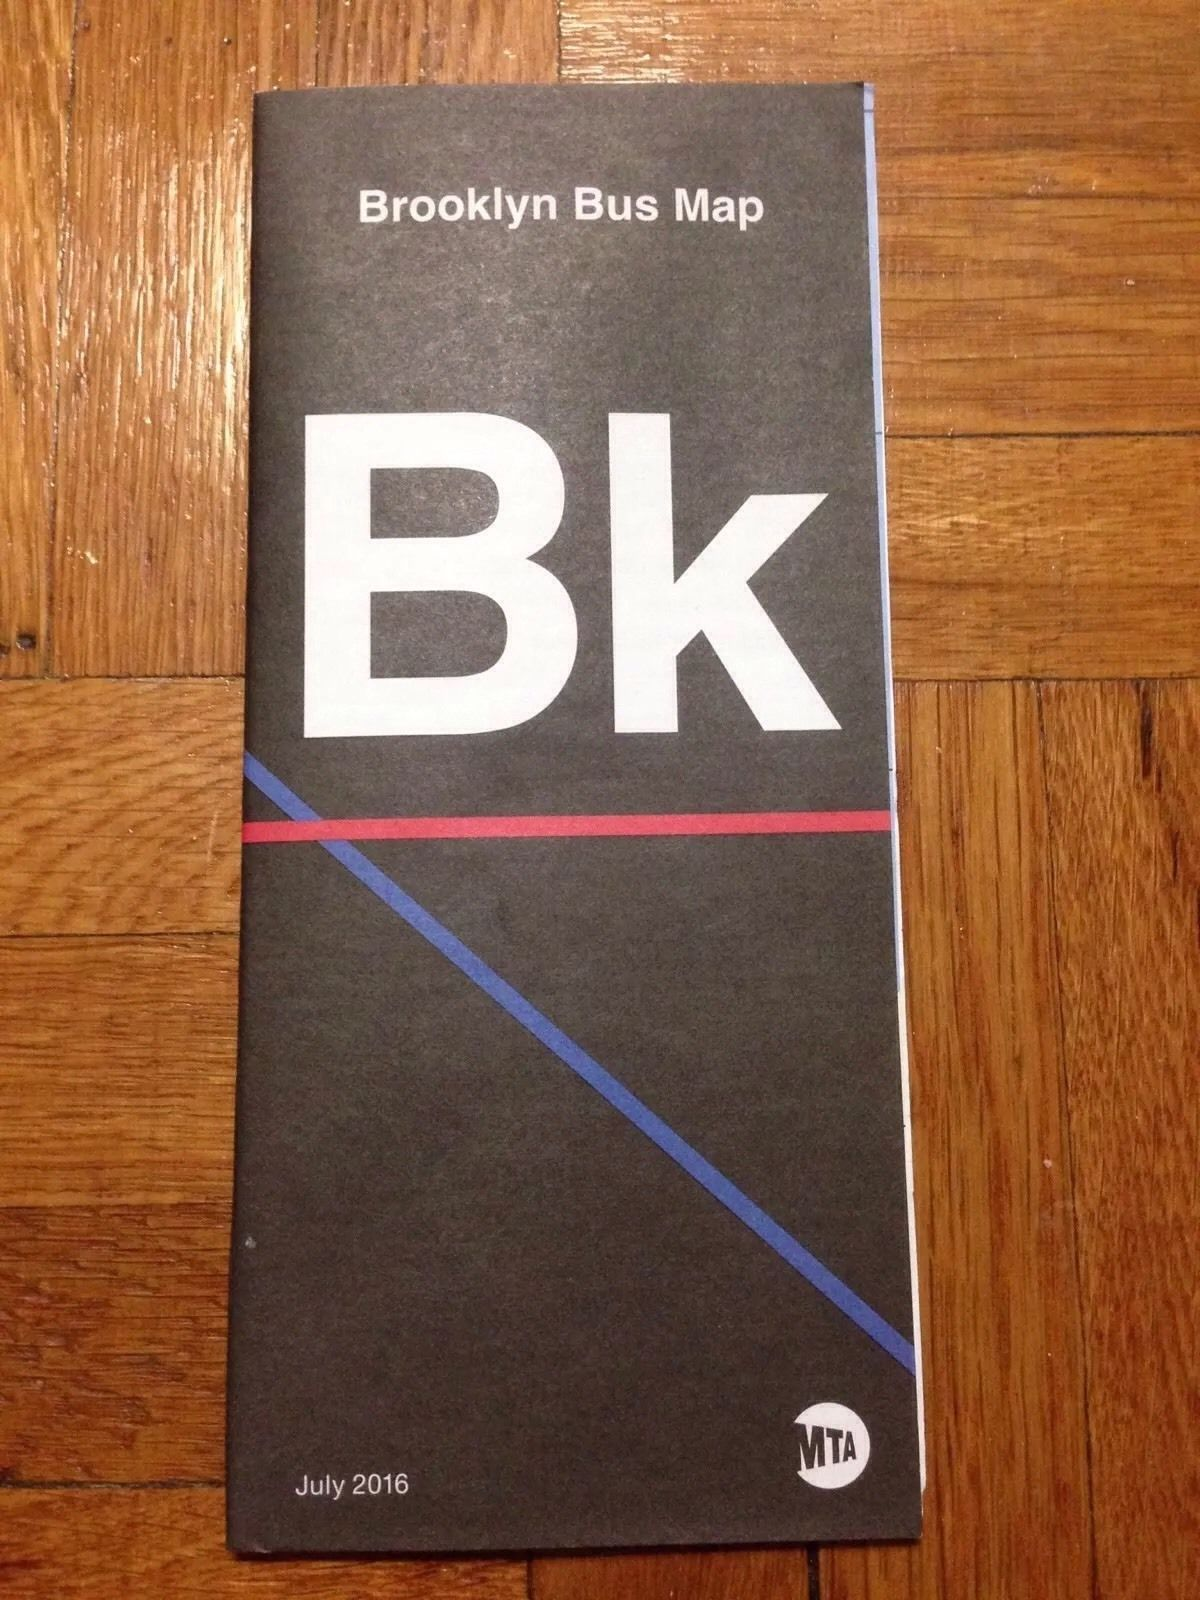 nyc mta brooklyn bus map 2 99 York City Transit Brooklyn Borough Bk Nyc Mta Bus Map nyc mta brooklyn bus map